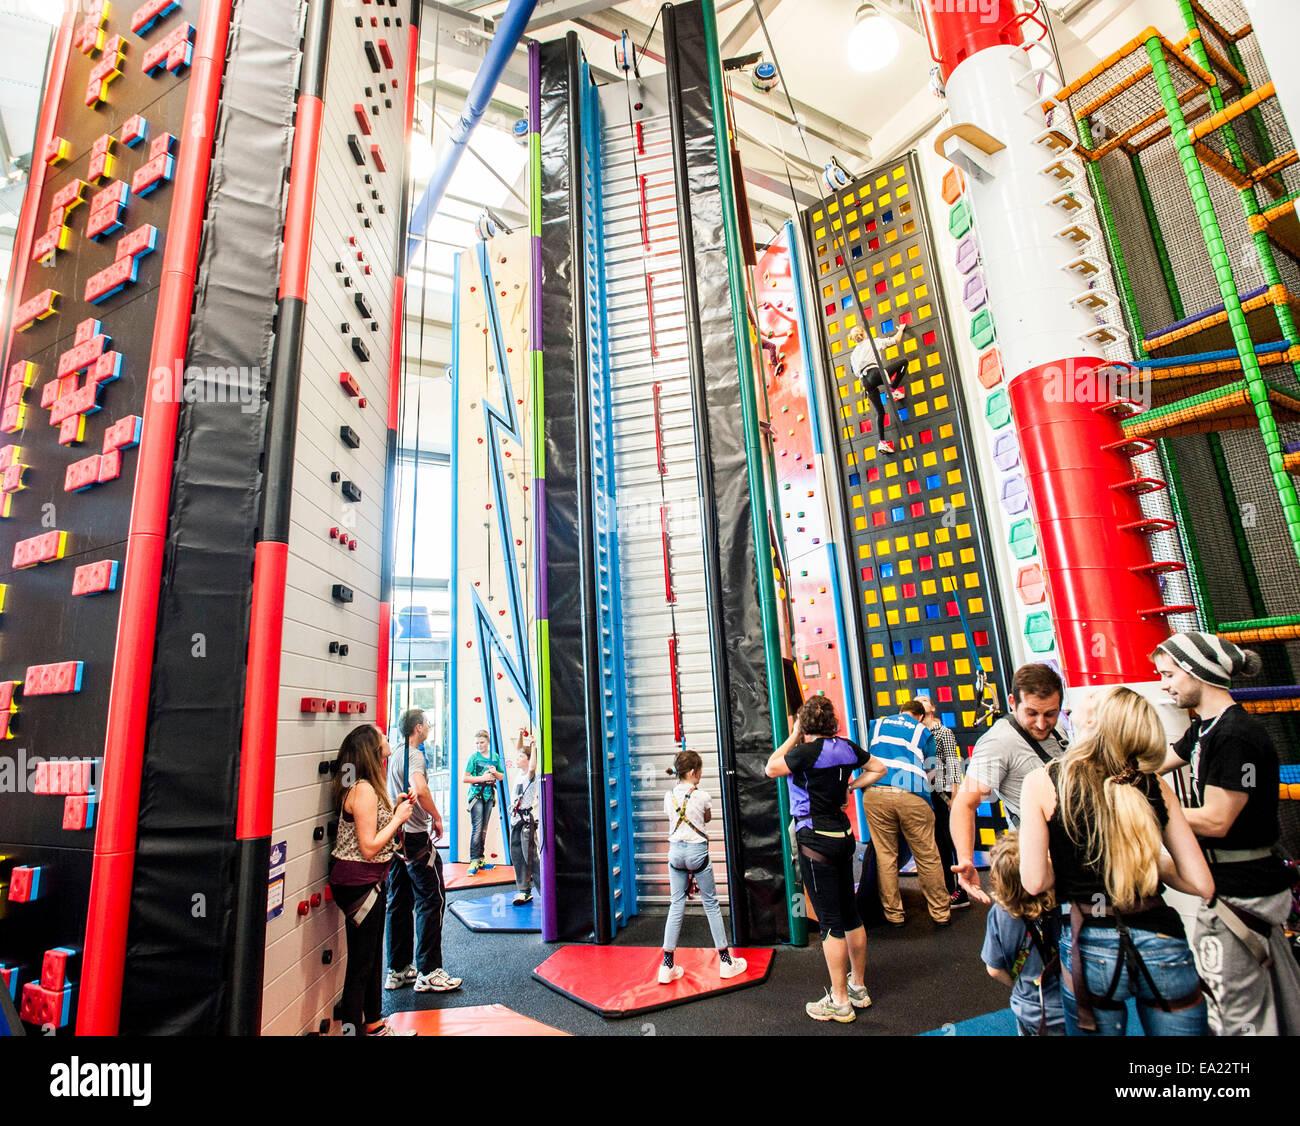 rock up an indoor climbing experience Whiteley Fareham - Stock Image